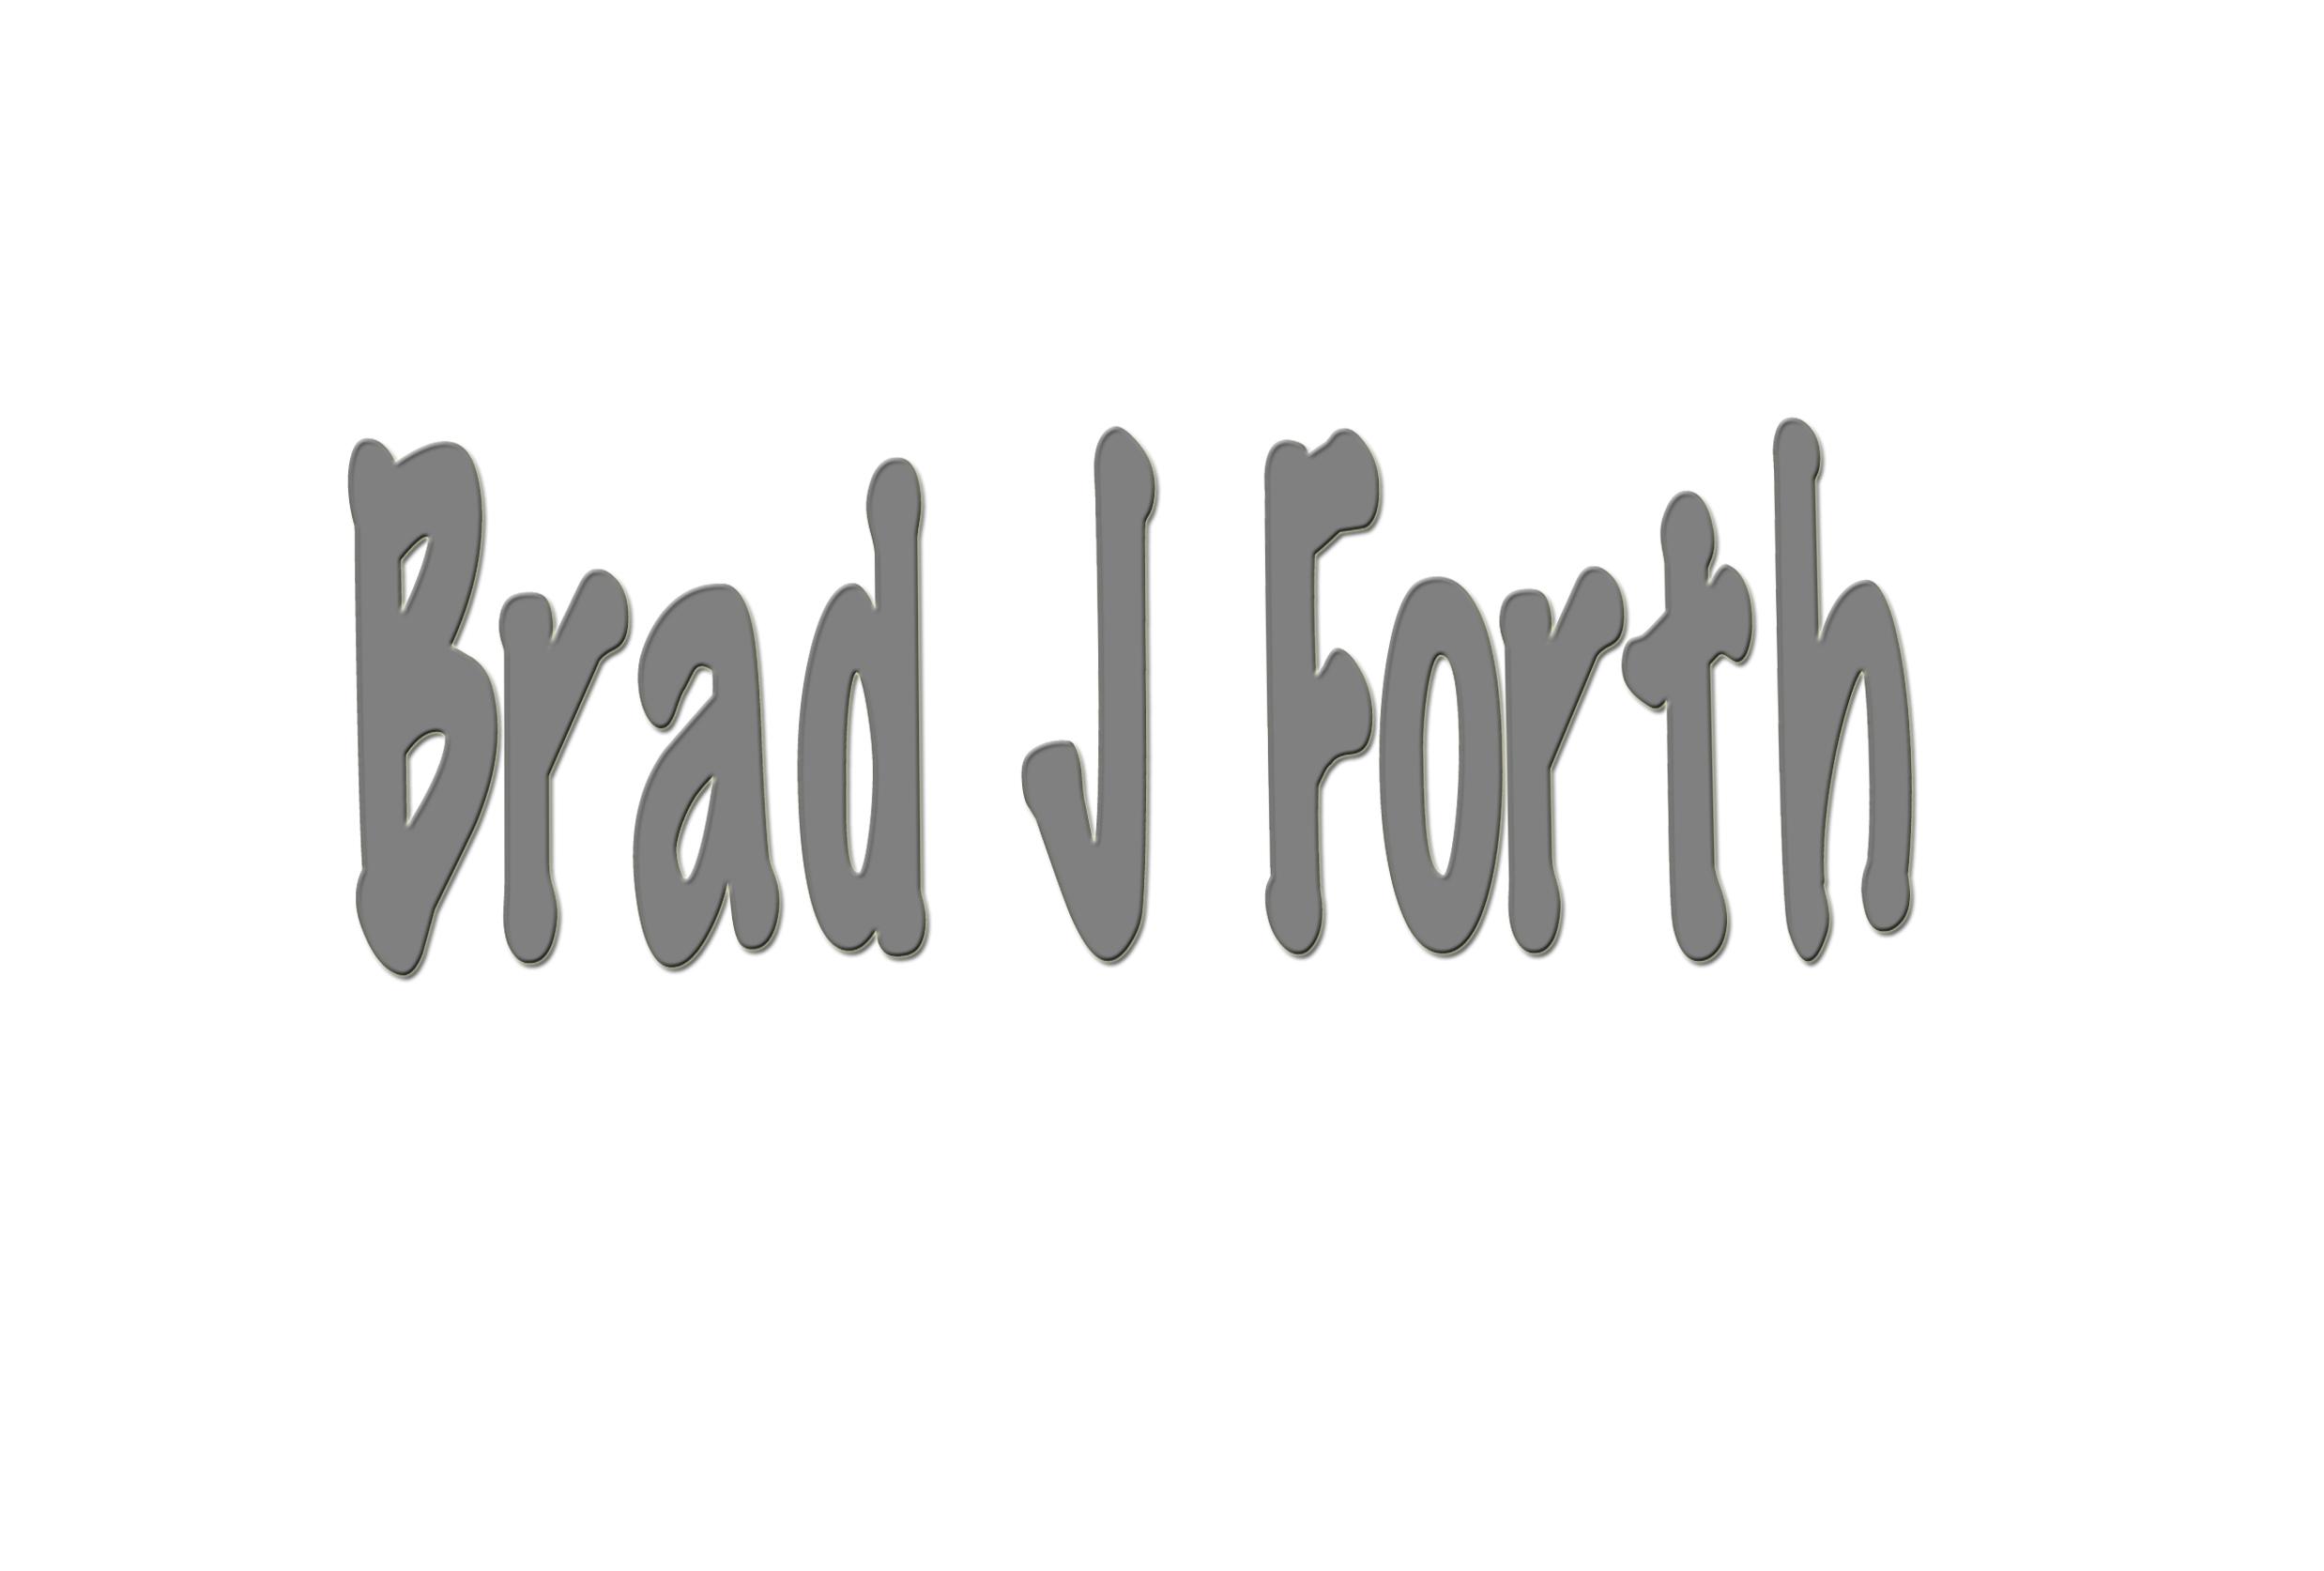 Brad Forth Signature